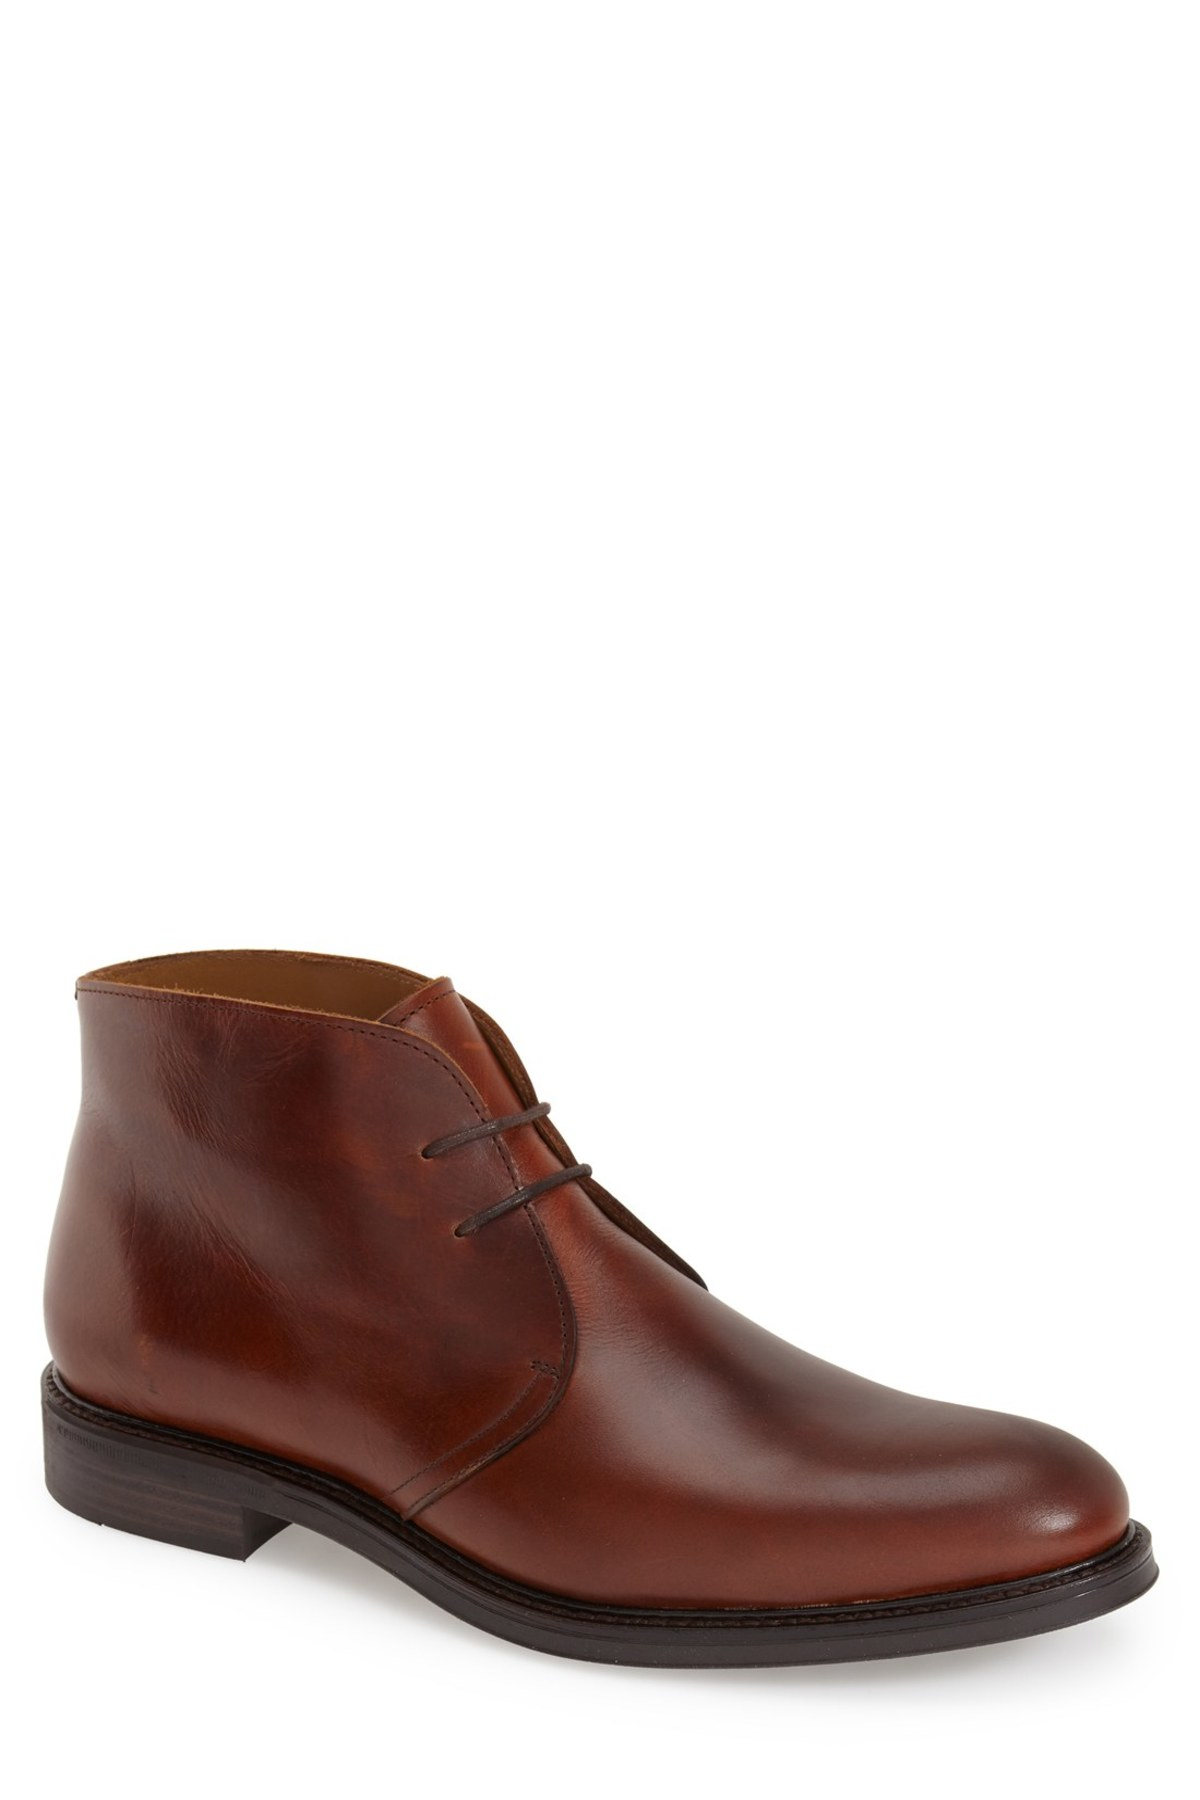 Campobello Shoes Uk